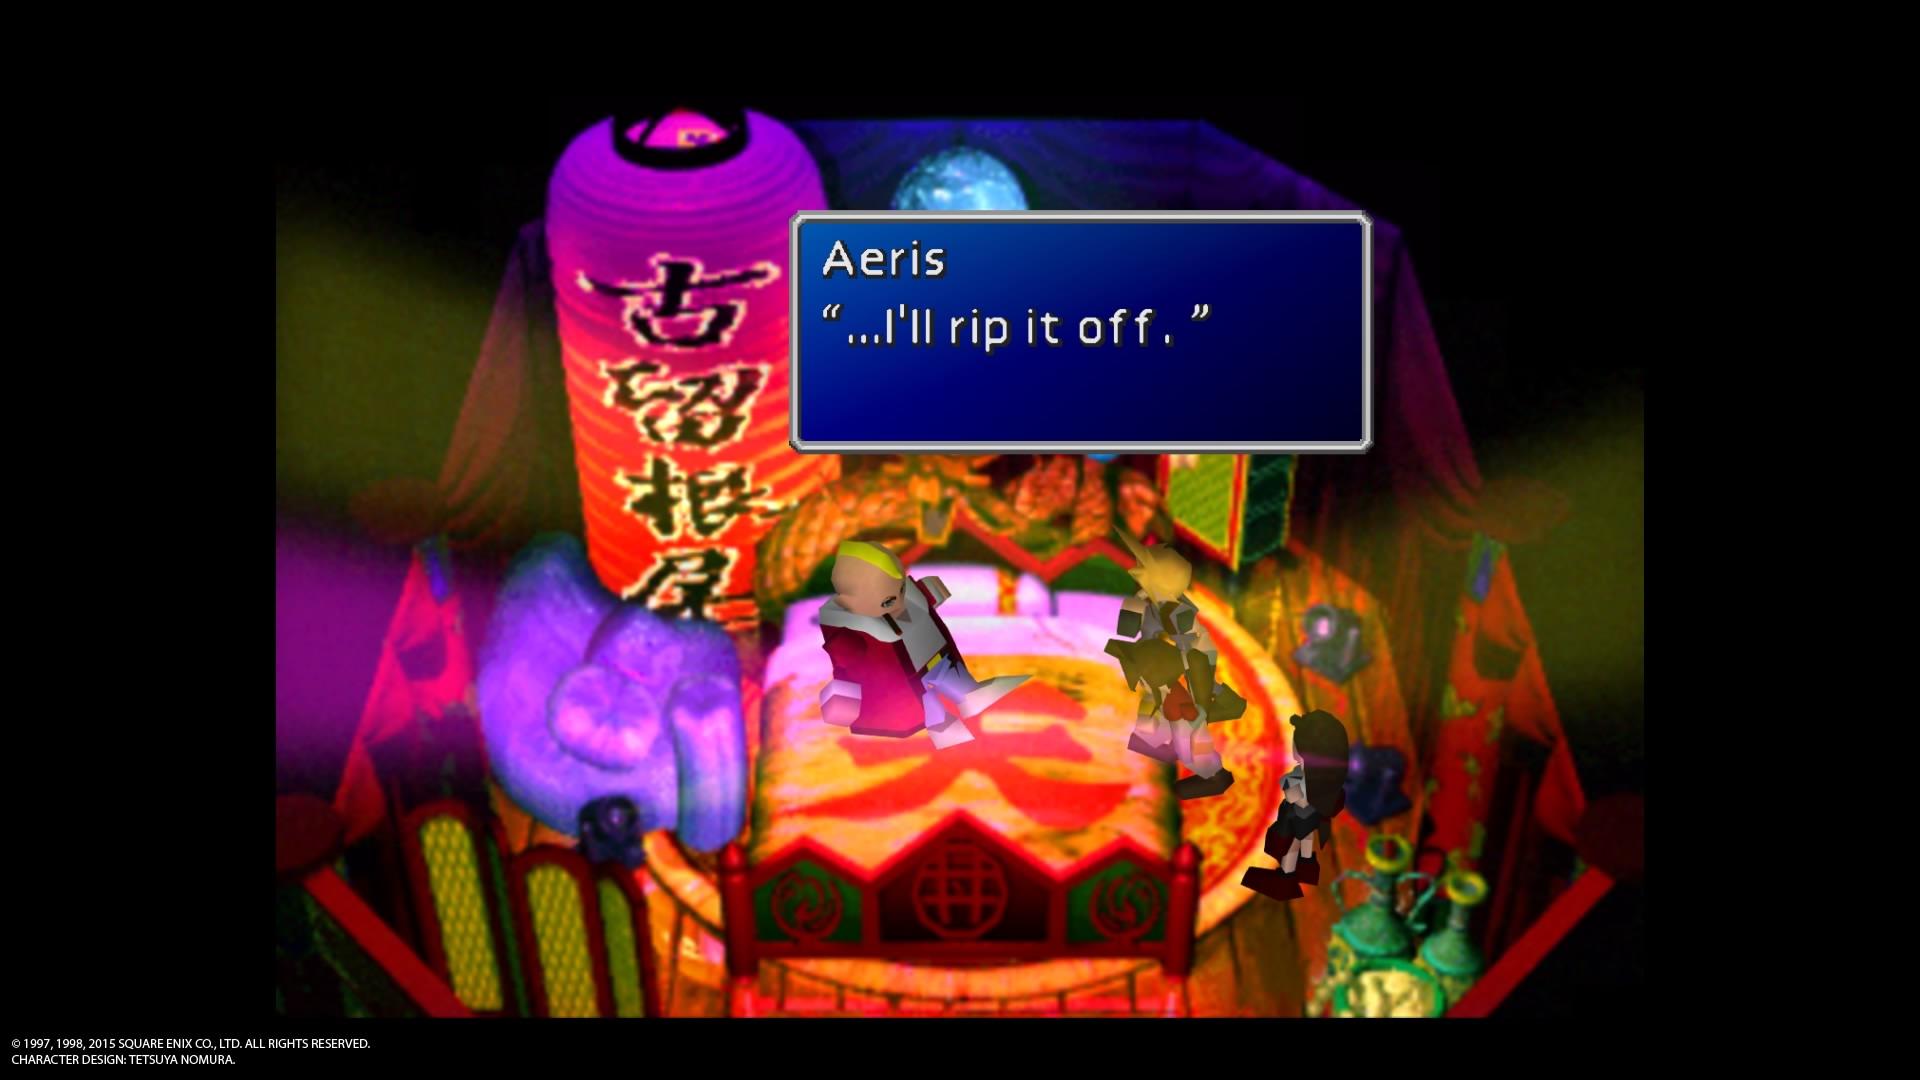 #05 Emily Rose England - Final Fantasy VII is, unintentionally, very feminist.